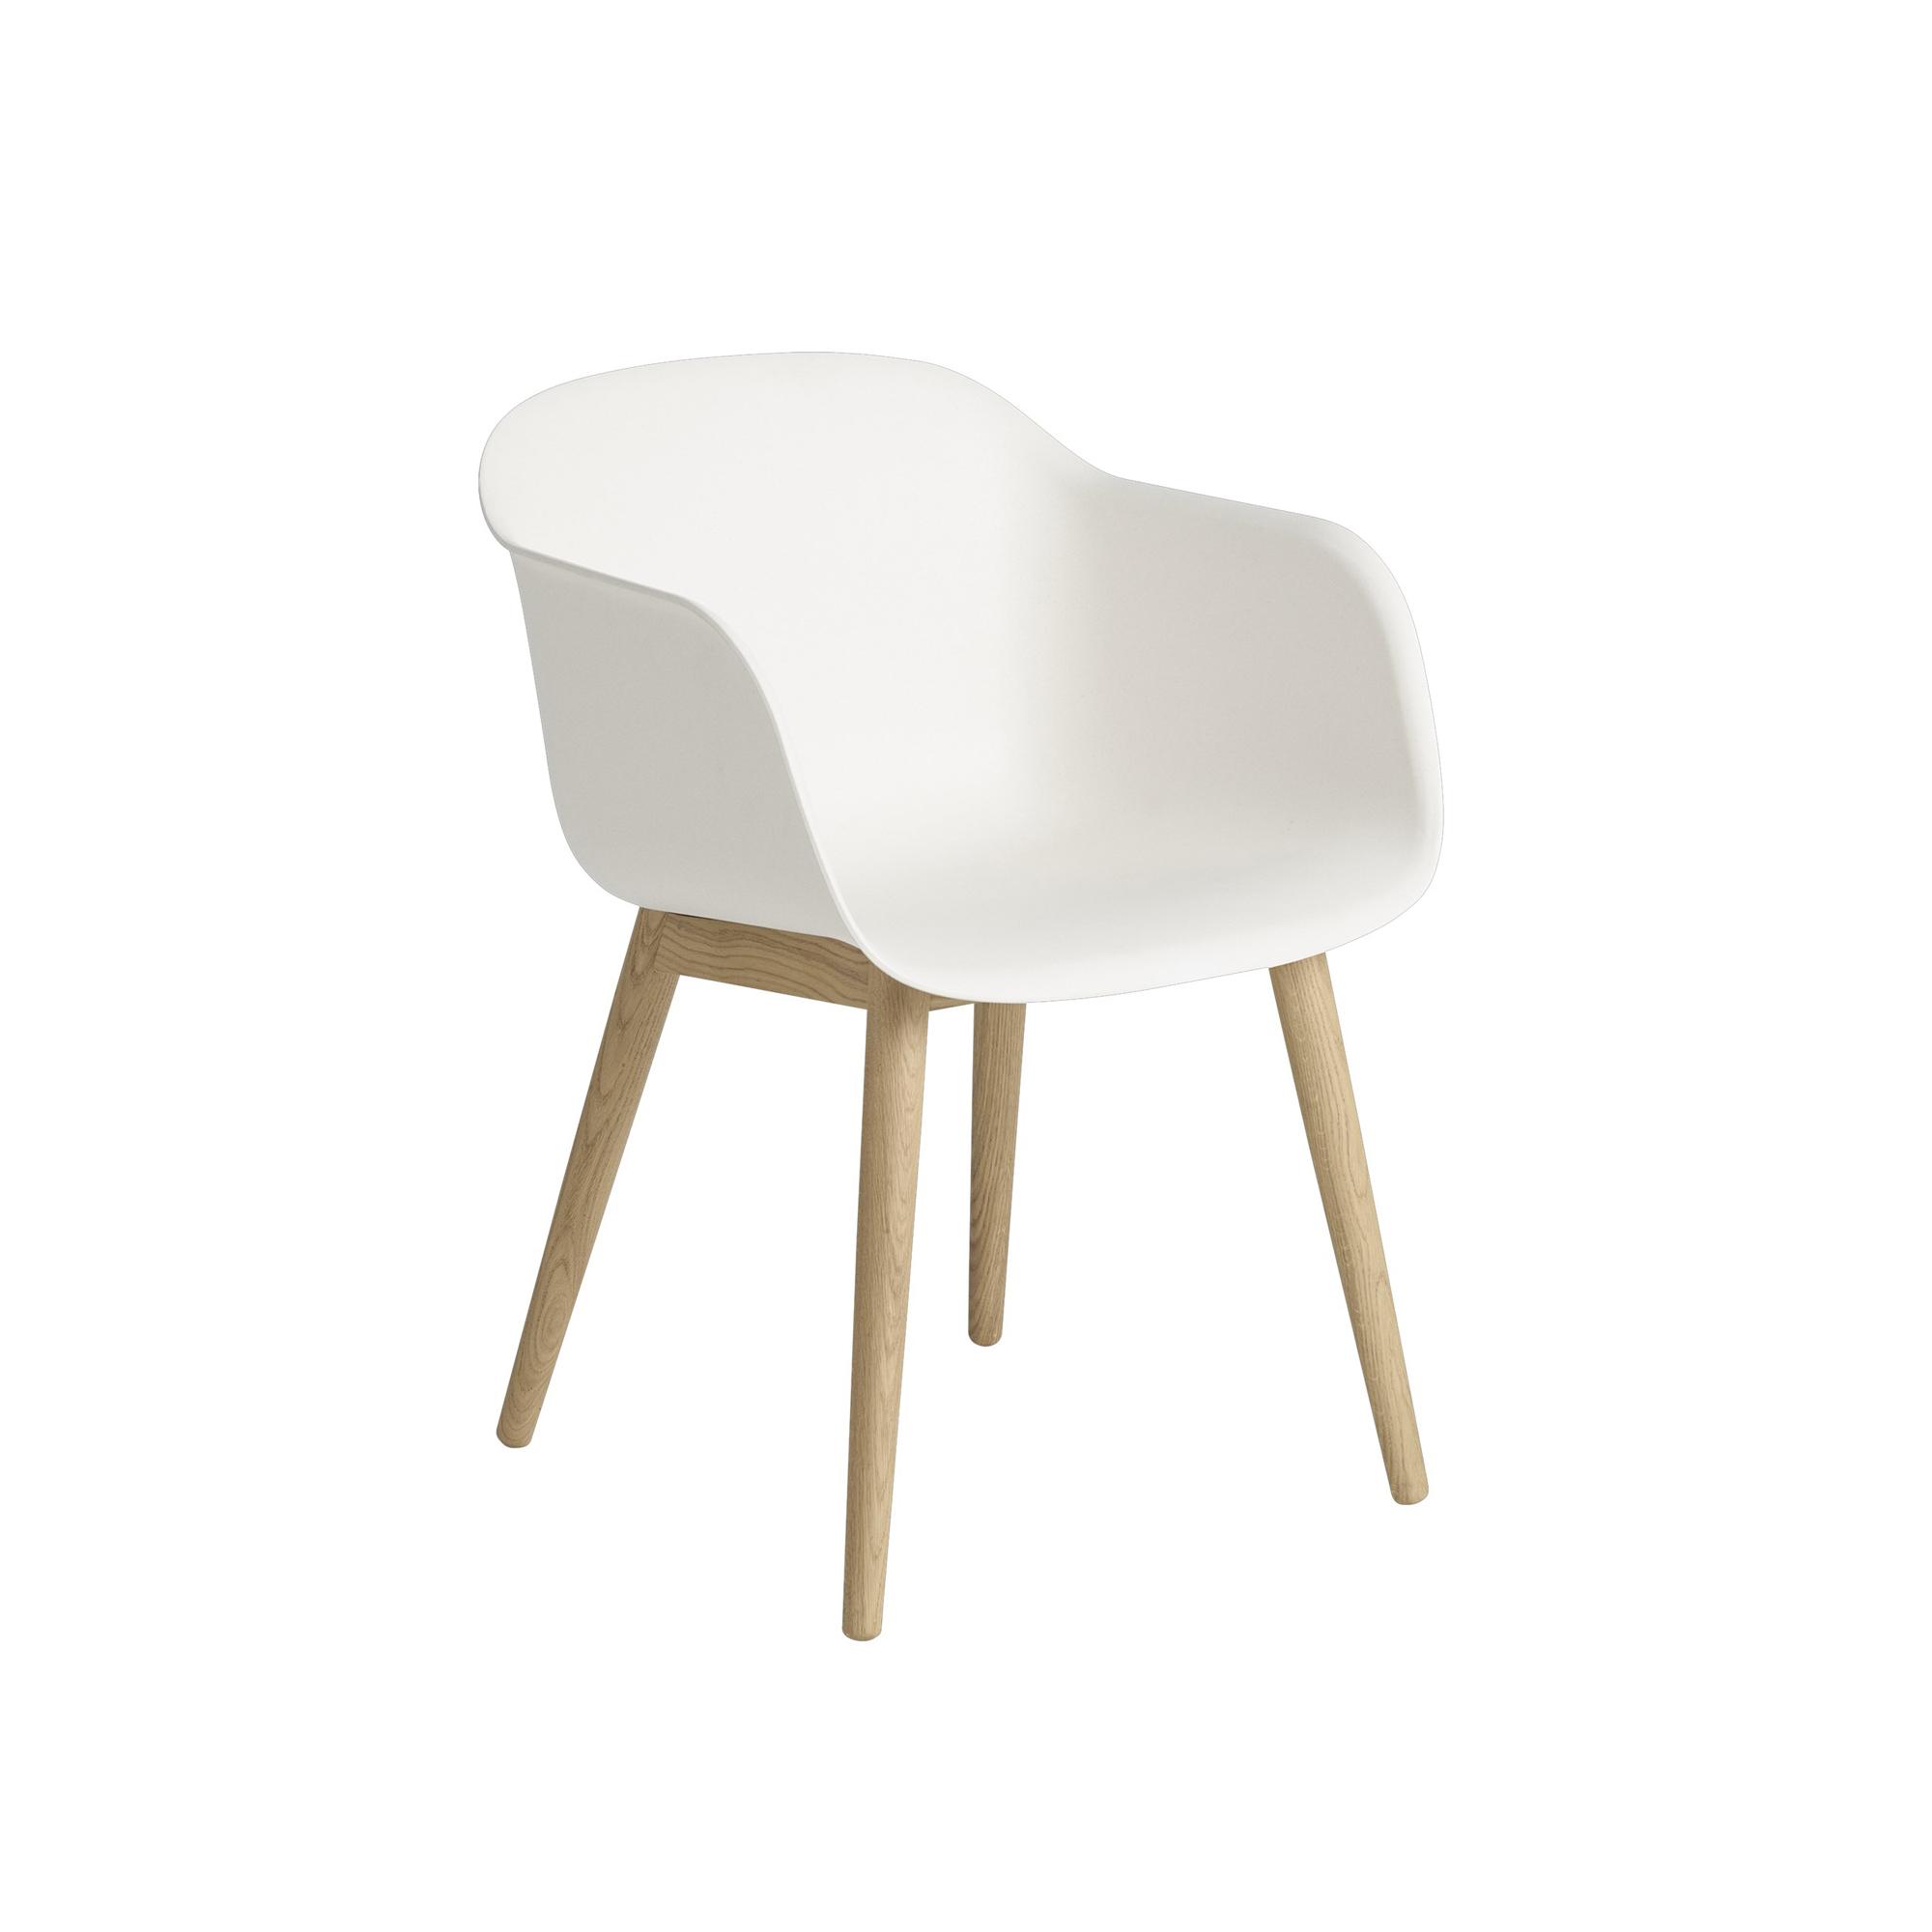 Designtorget Stol Fiber wood vit/ek